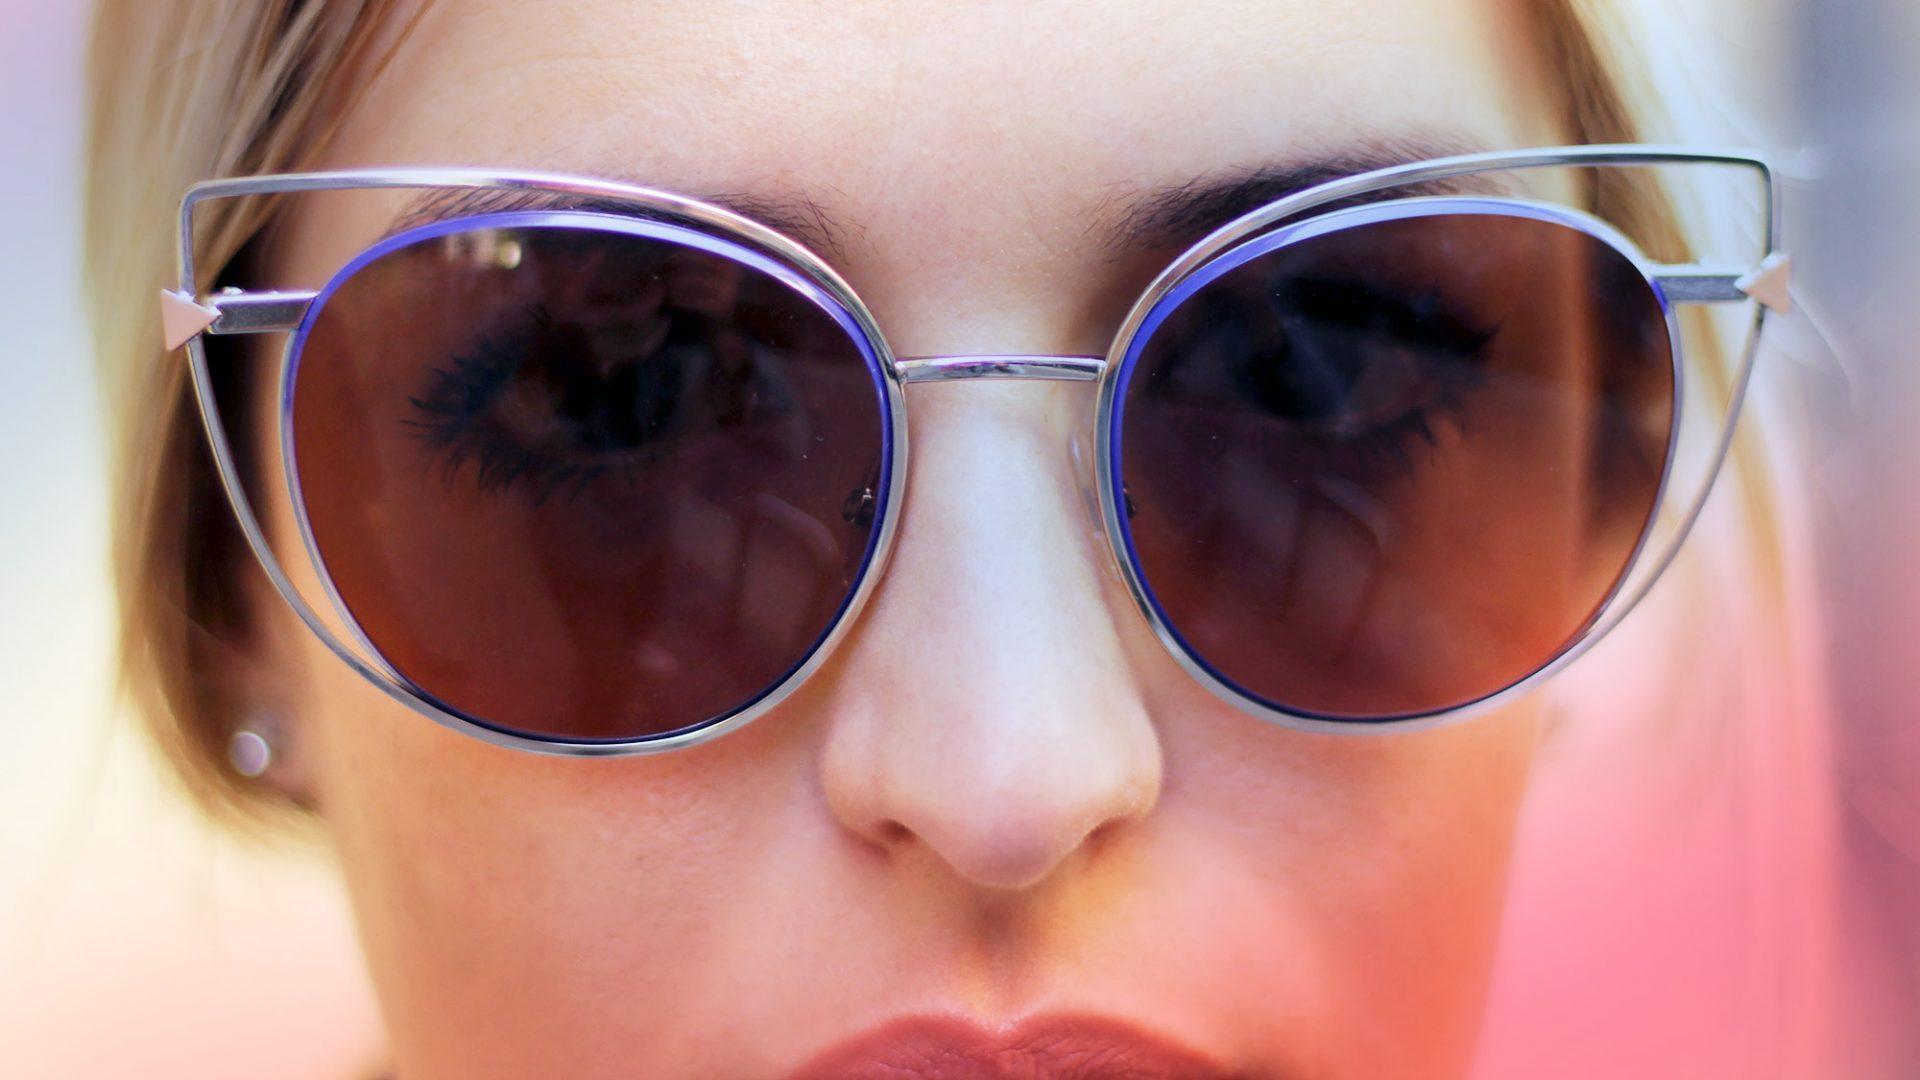 Sunglasses-for-spring-1-1920x1080